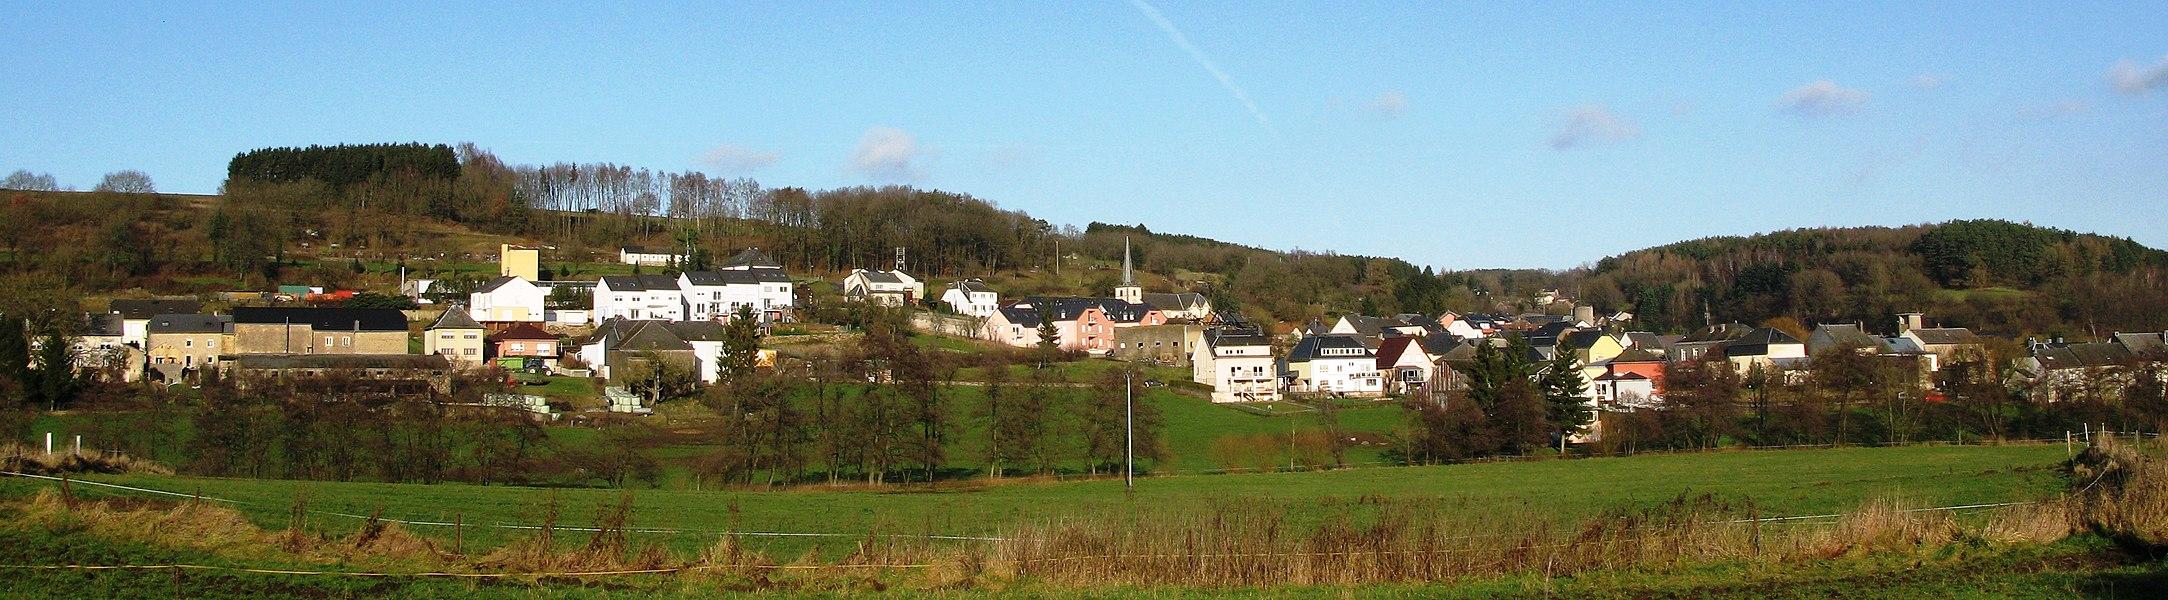 Le village luxembourgeois de Hobscheid